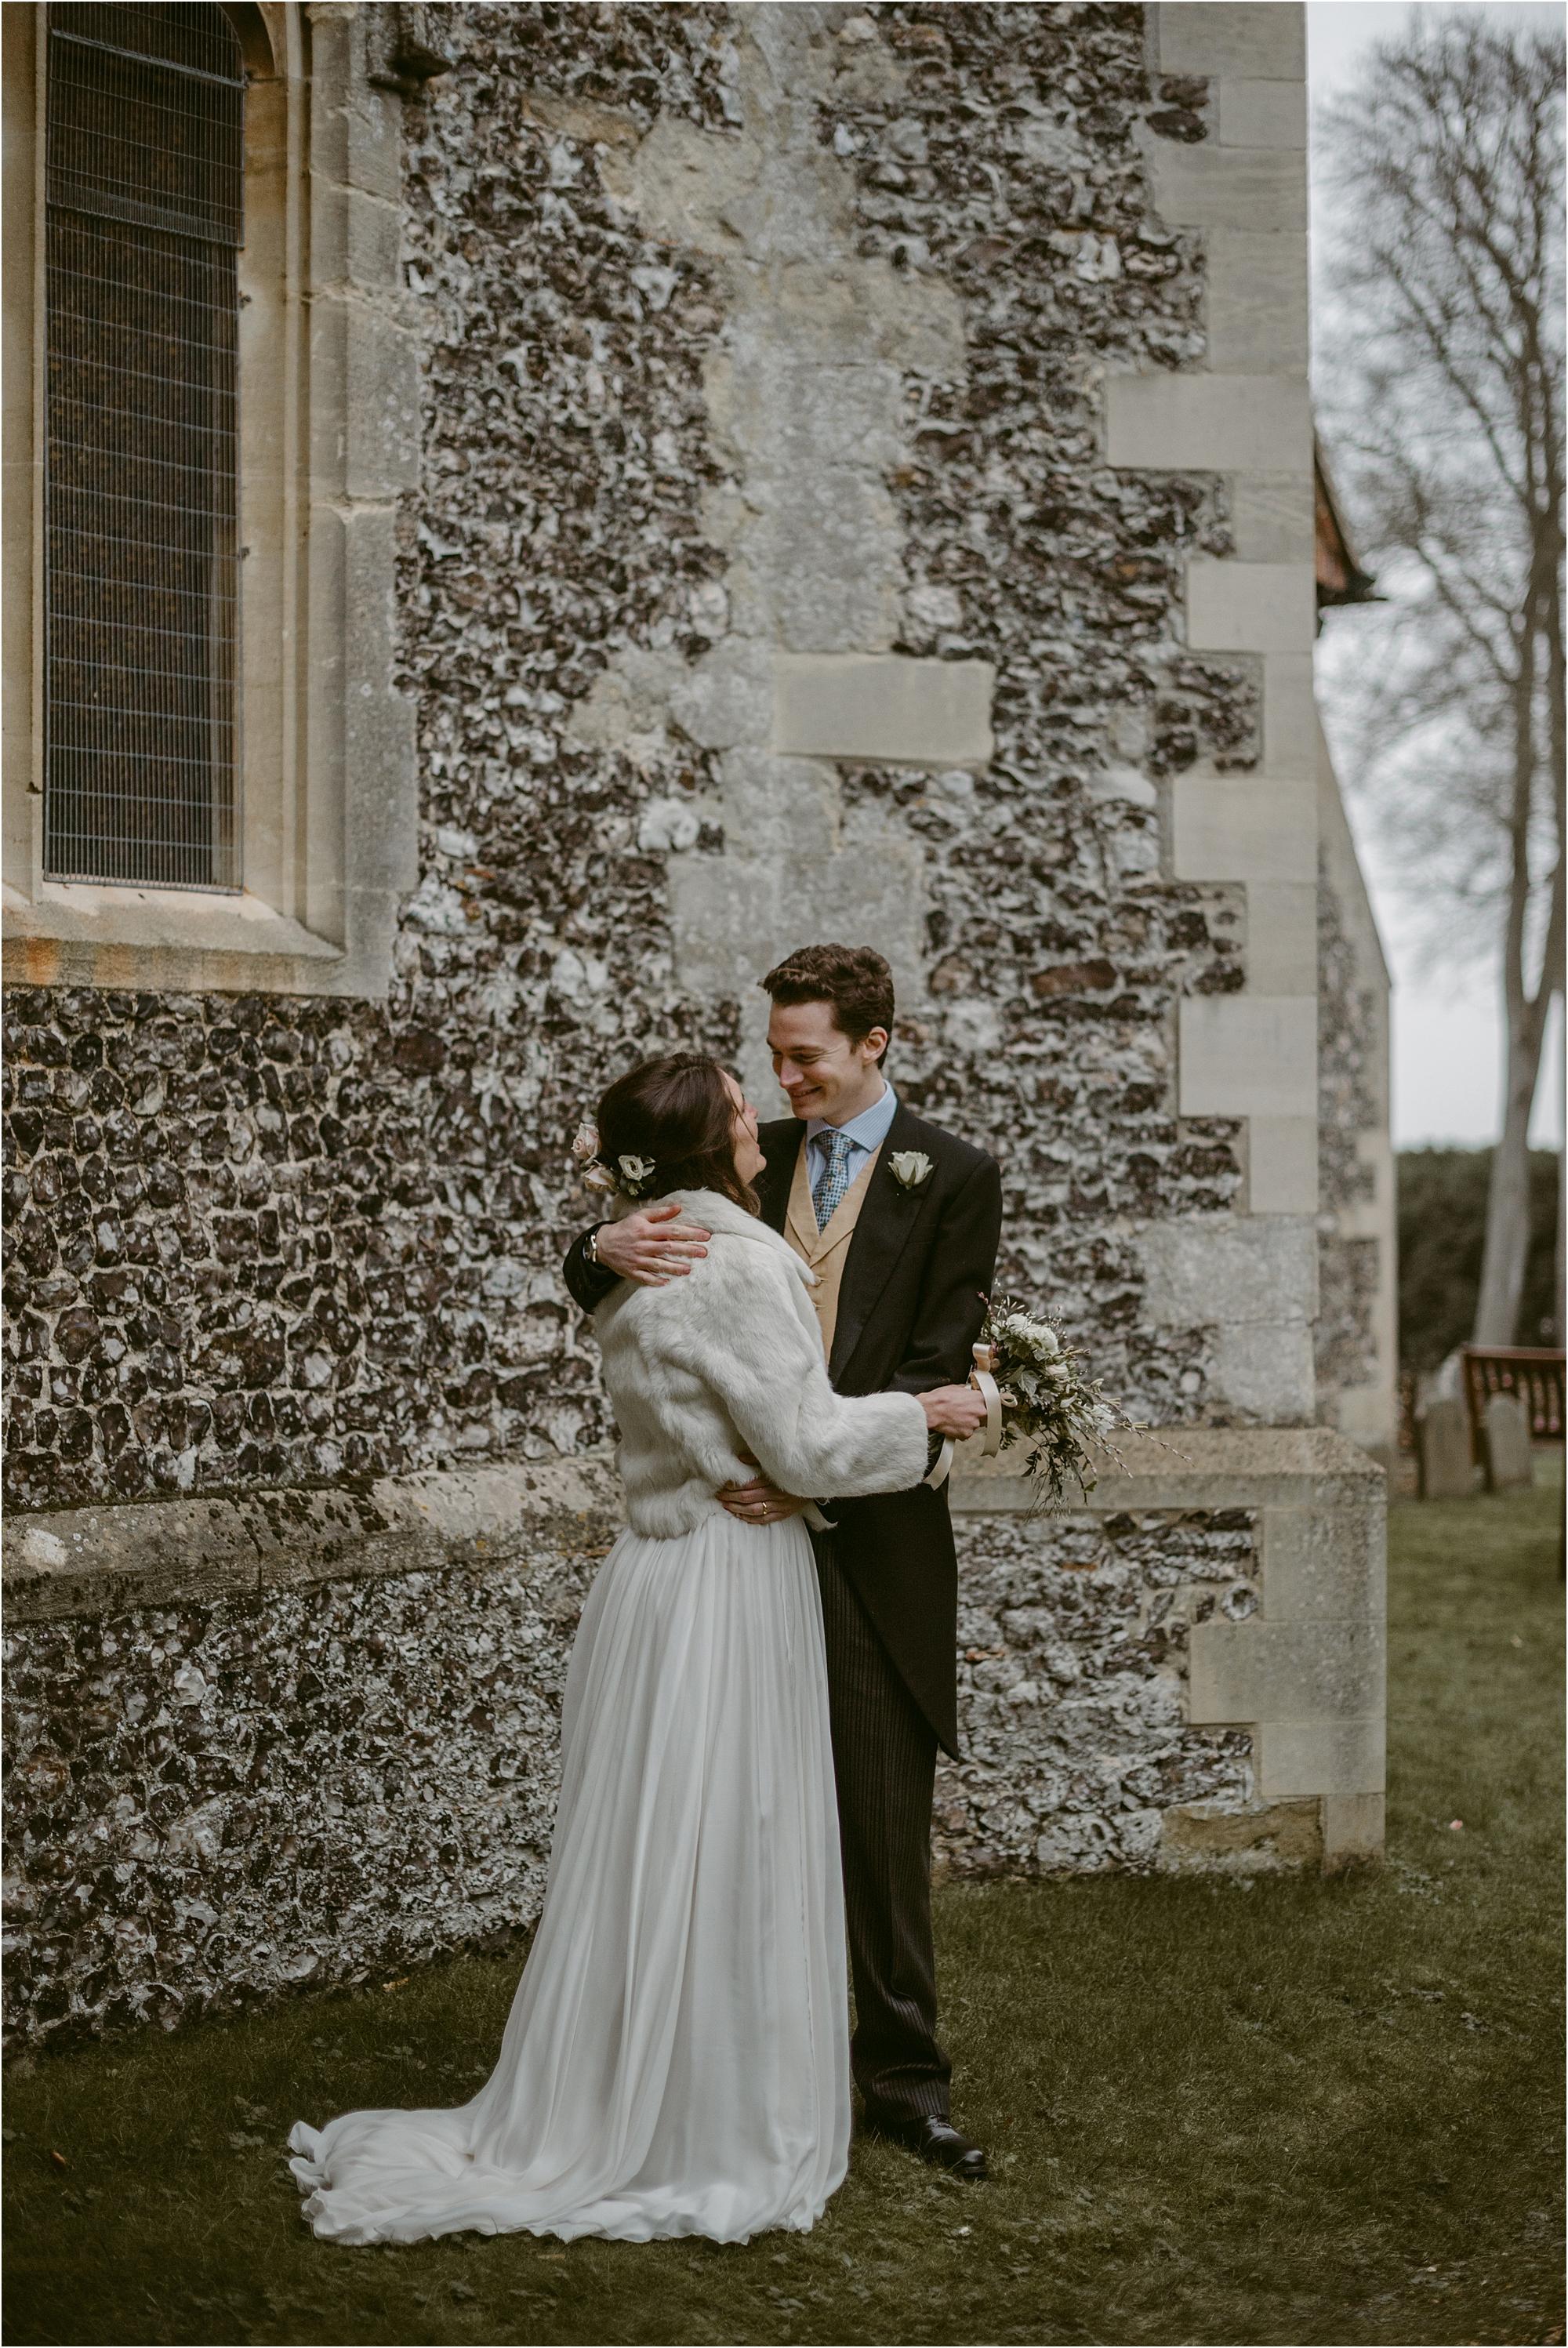 Rose+Harry-outdoor-english-wedding-photography__0146.jpg